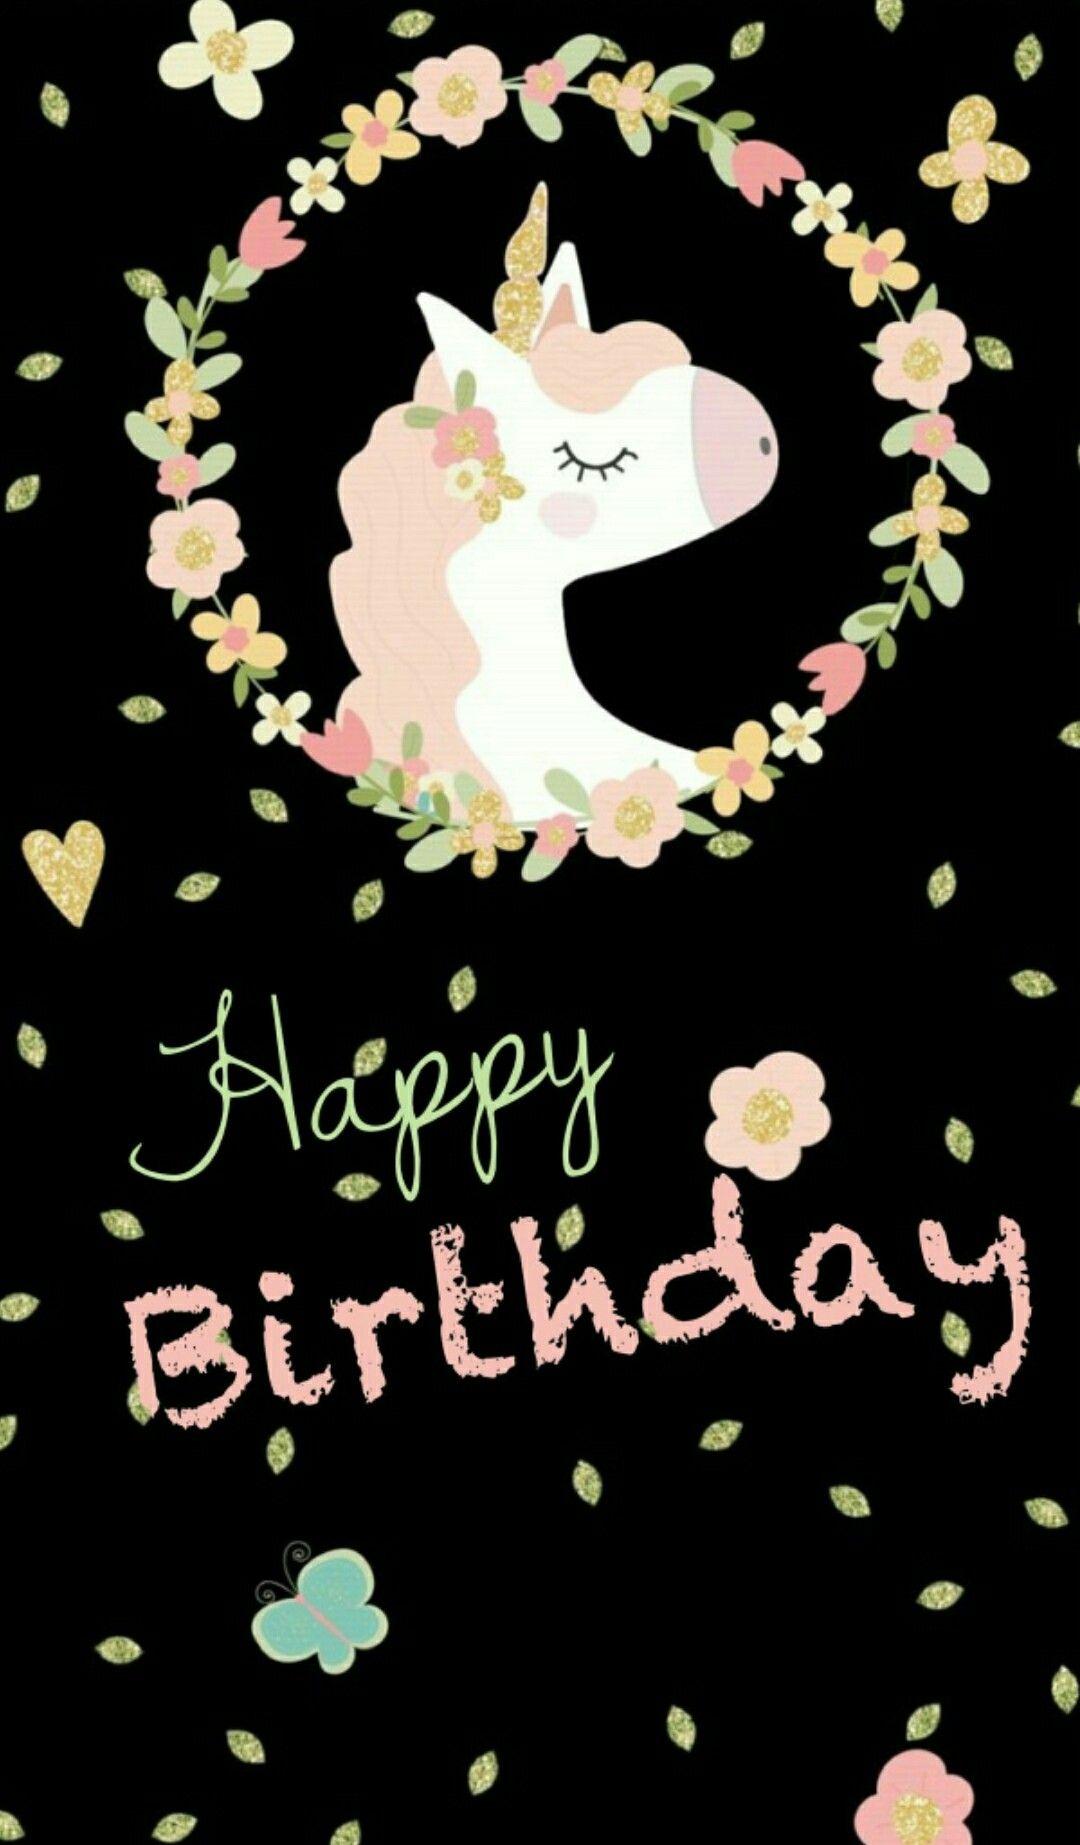 Pin by Virginia Lovell on Happy birthday Happy birthday